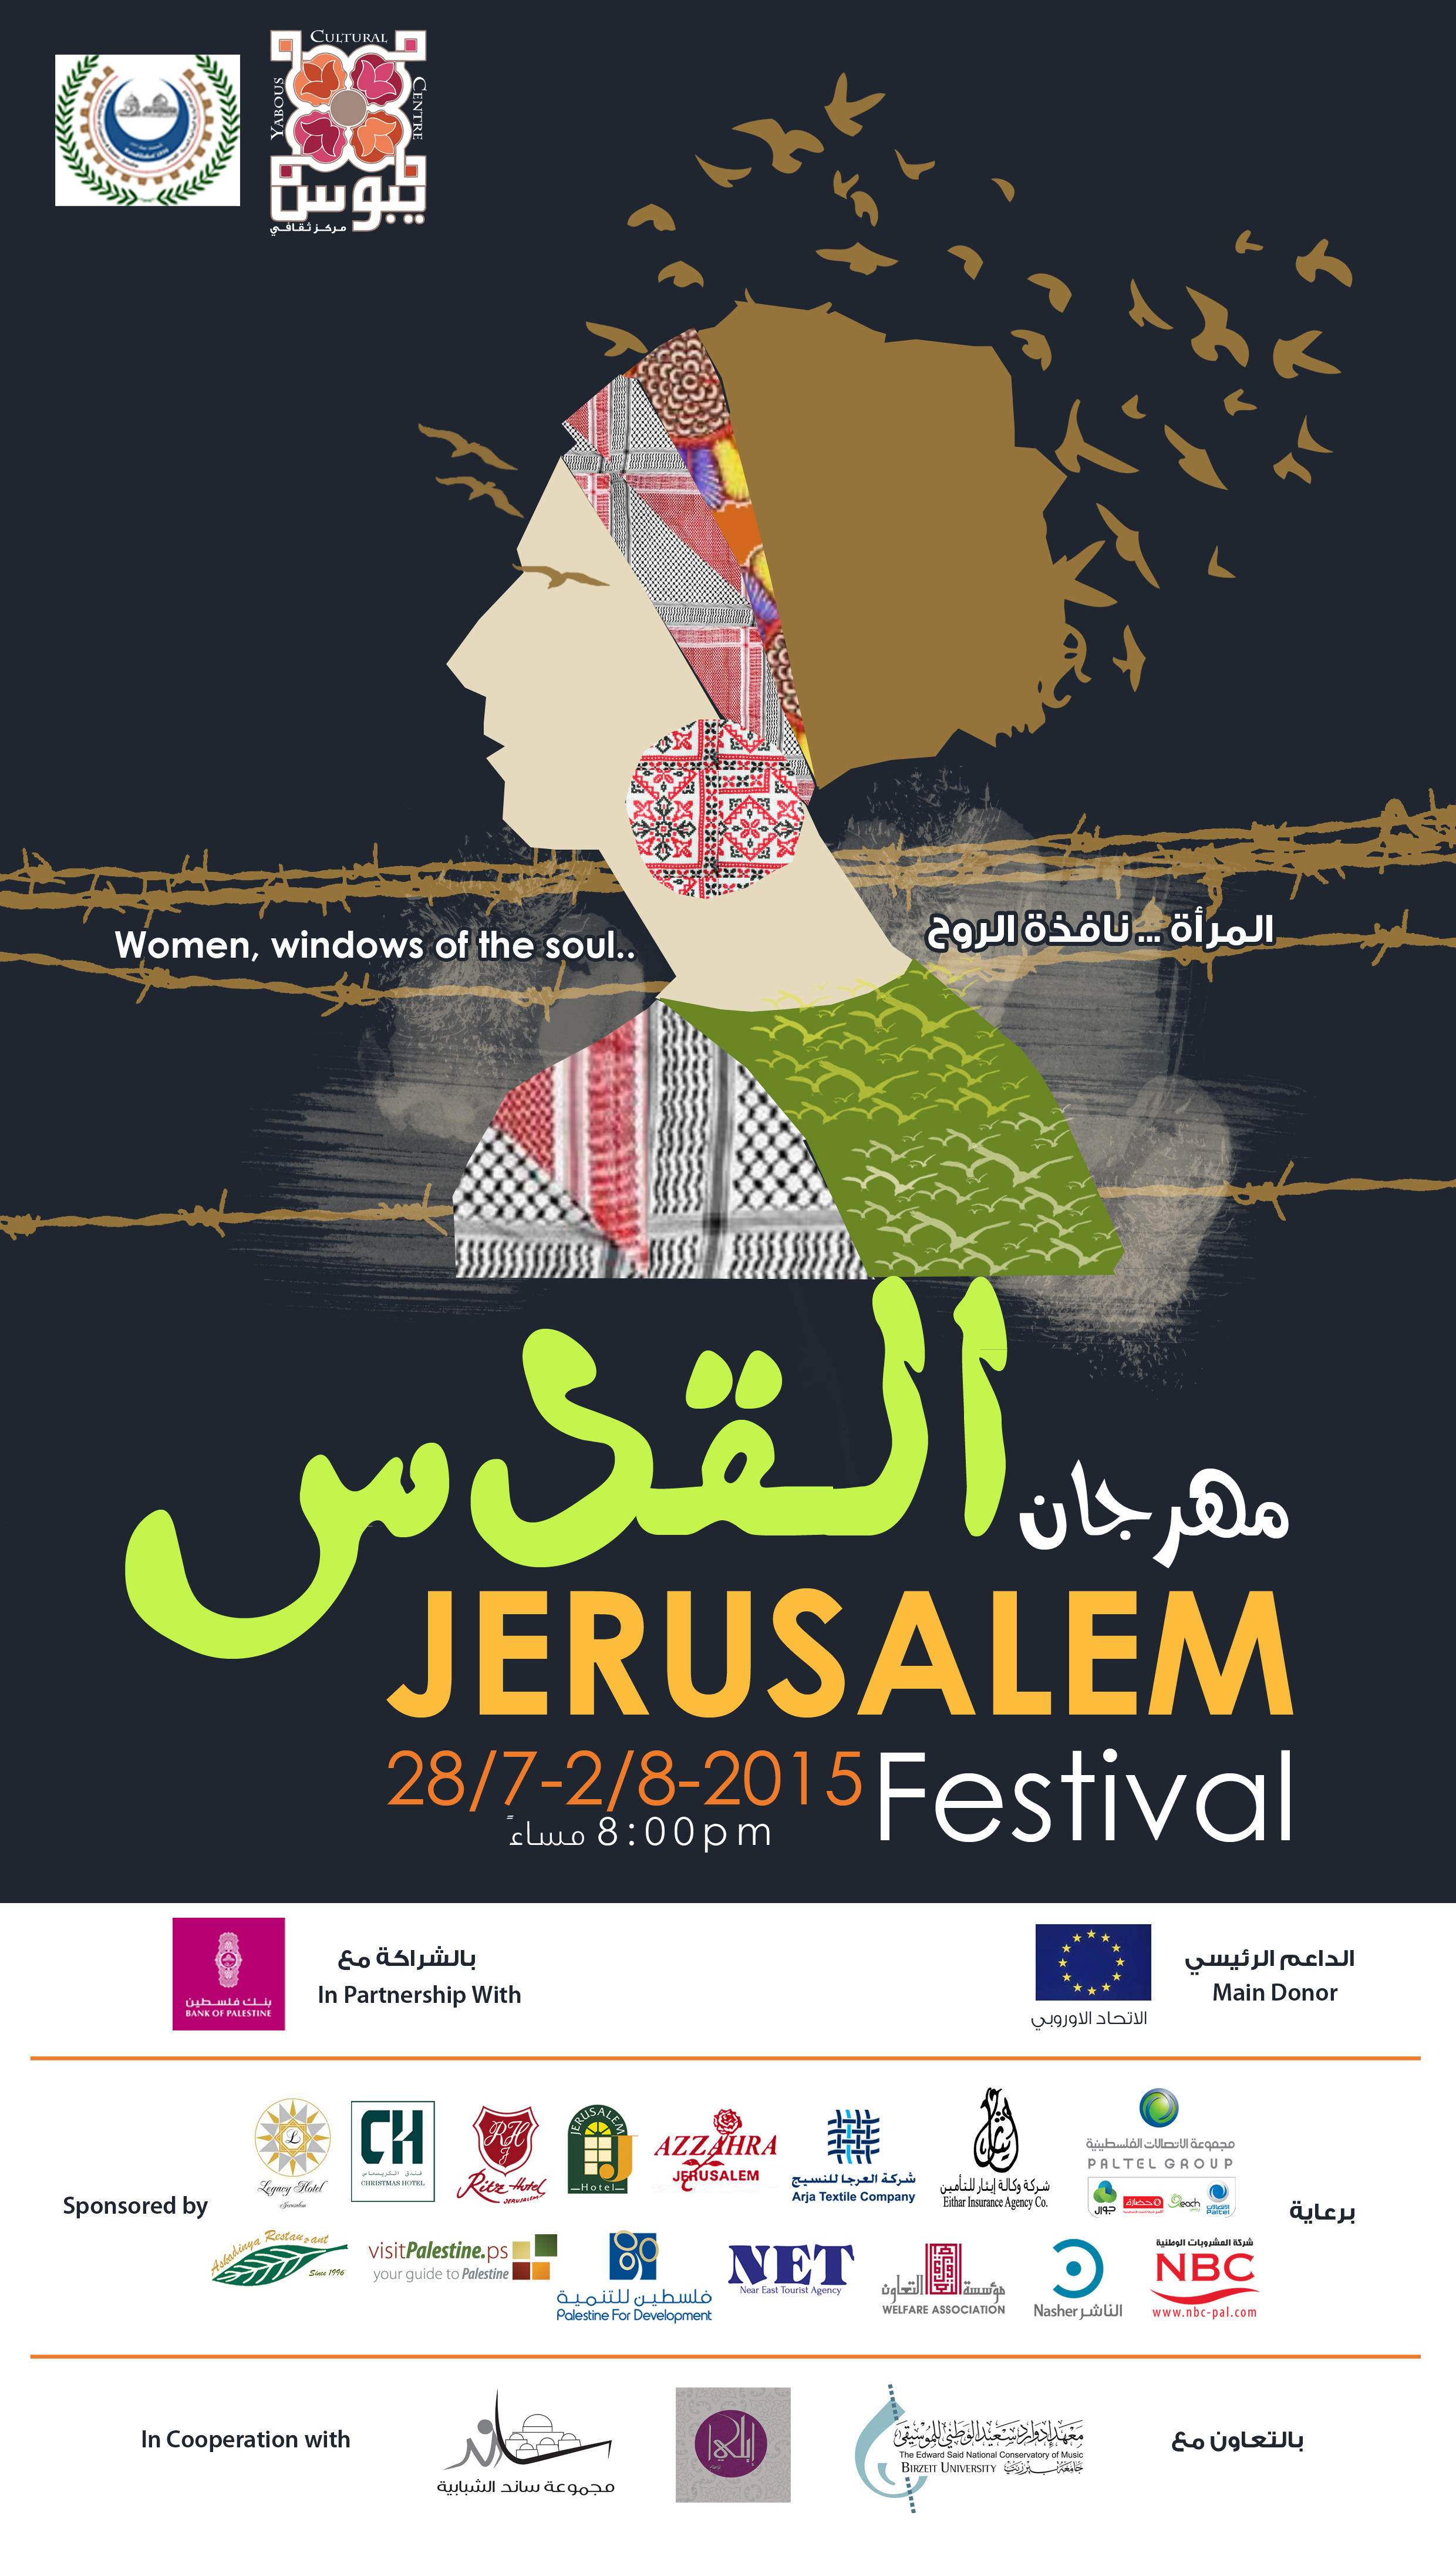 Jerusalem Festival Poster